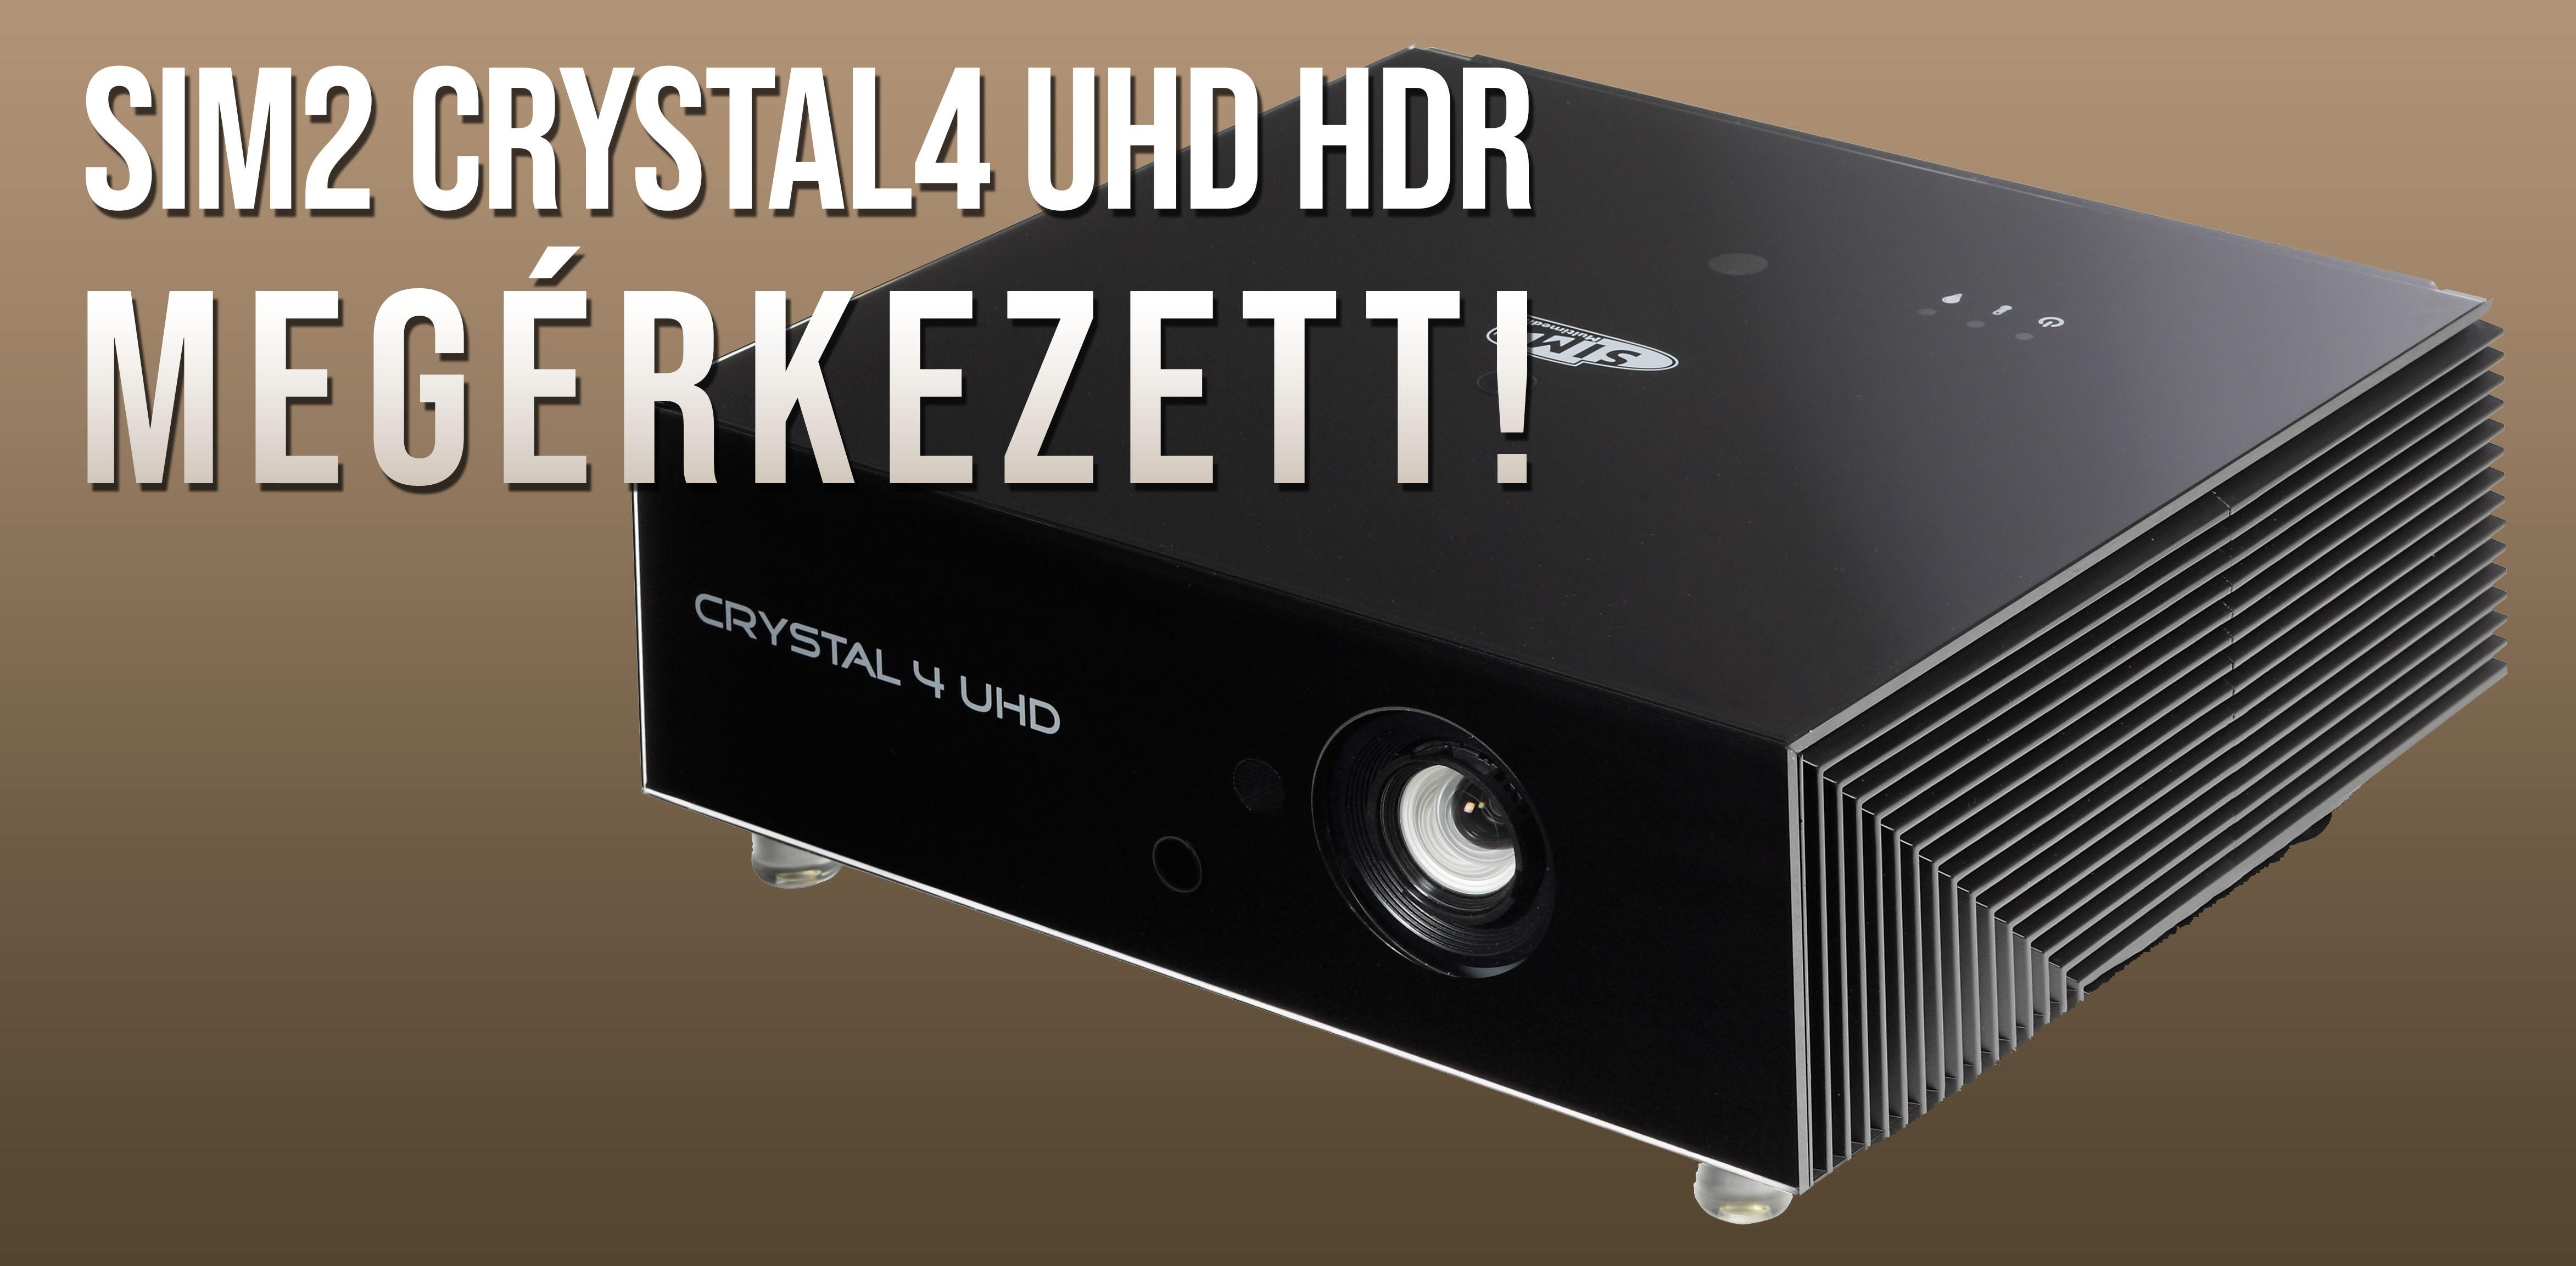 Sim2 Crystal4